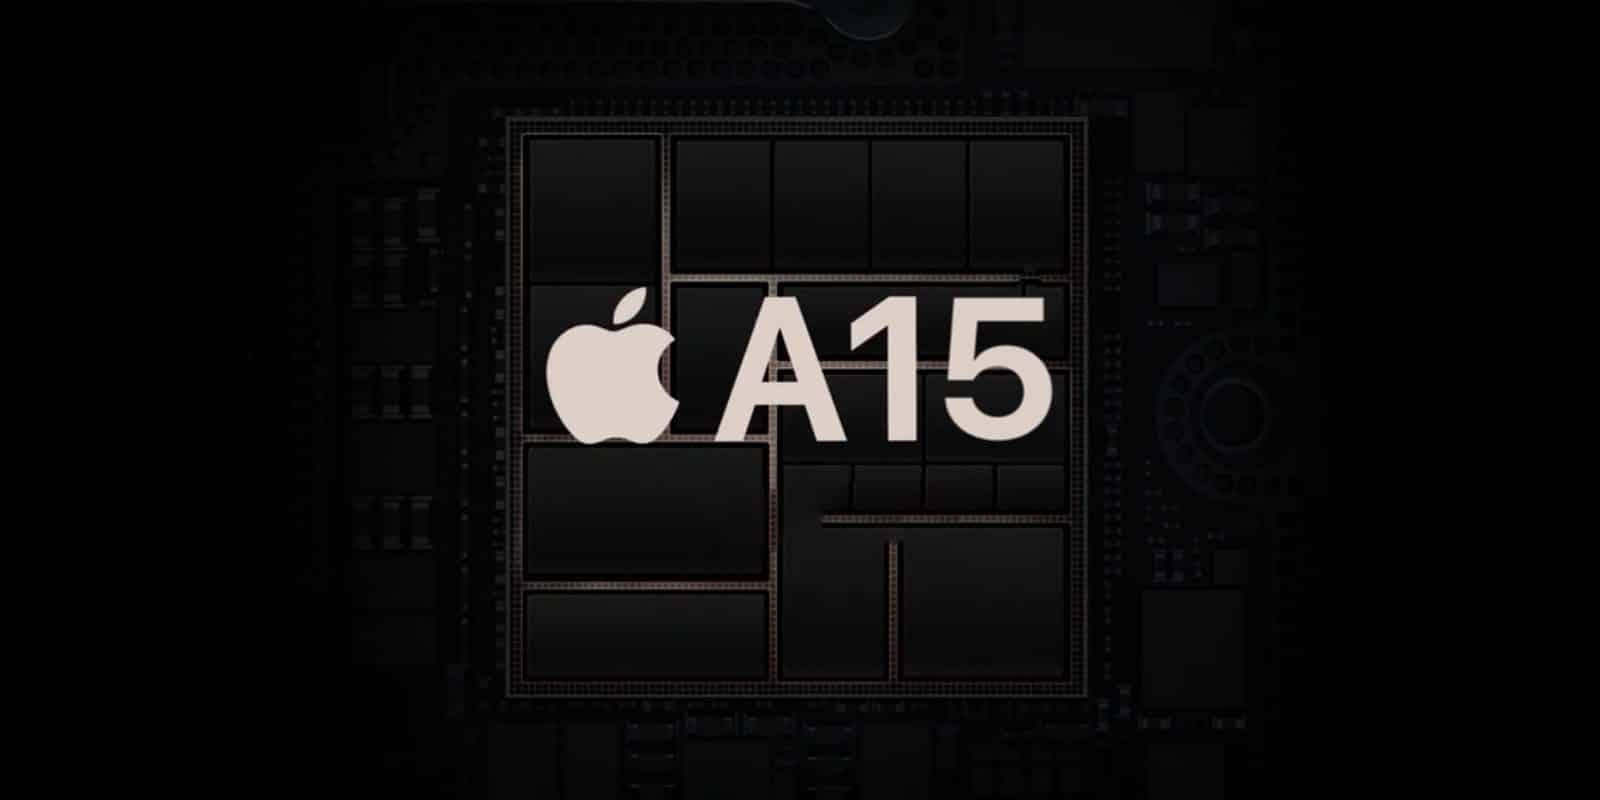 Apple supplier TSMC has begun producing the A15 Bionic chip